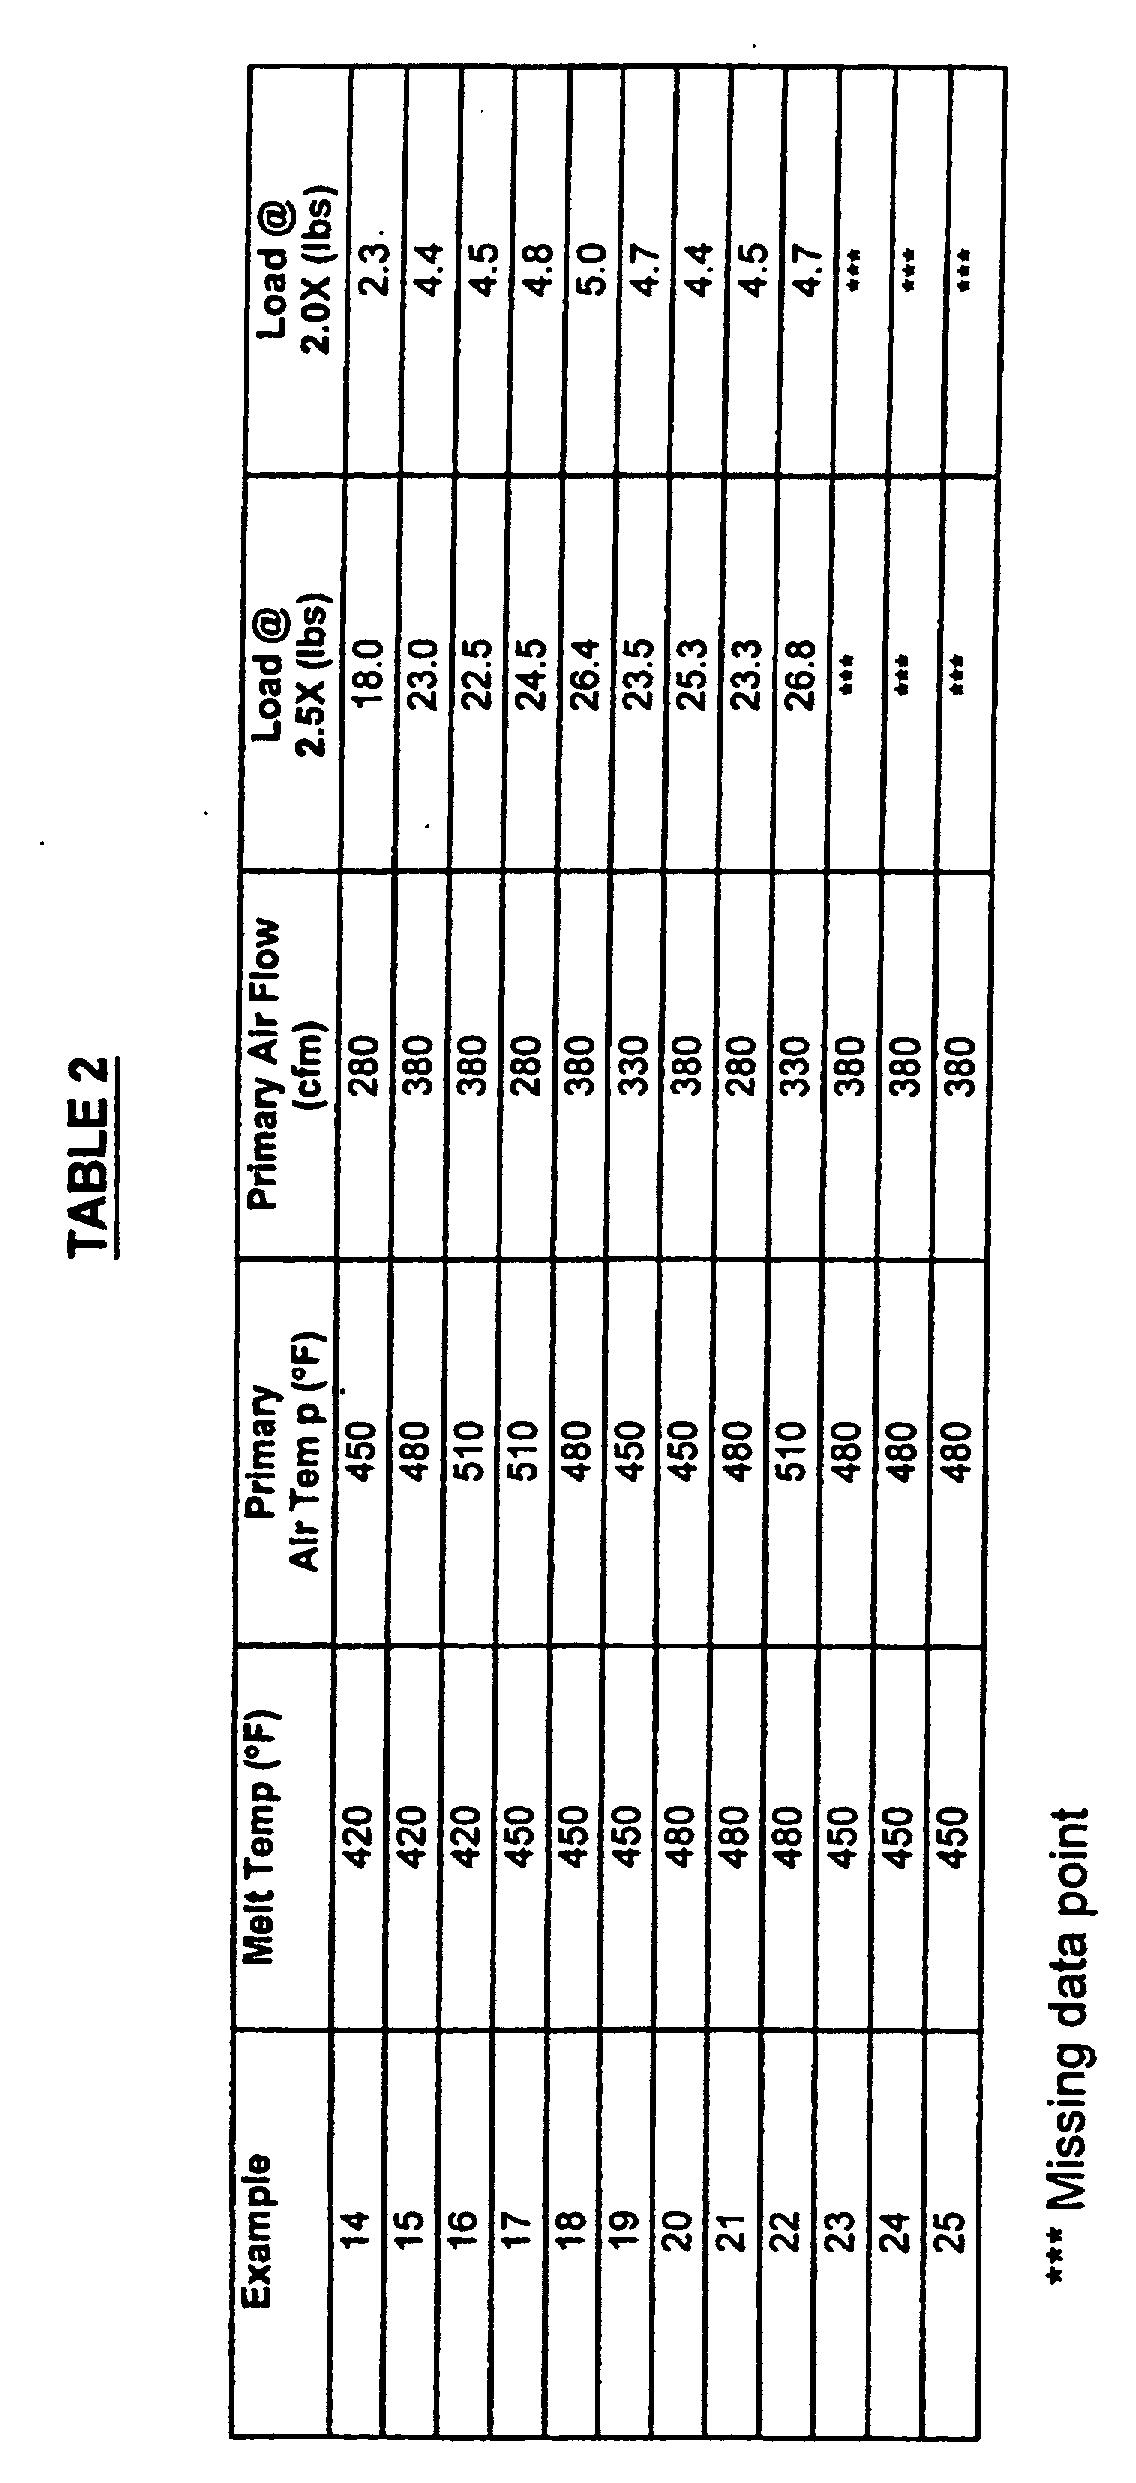 EP1085980B1 - Laminates of elastomeric and non-elastomeric